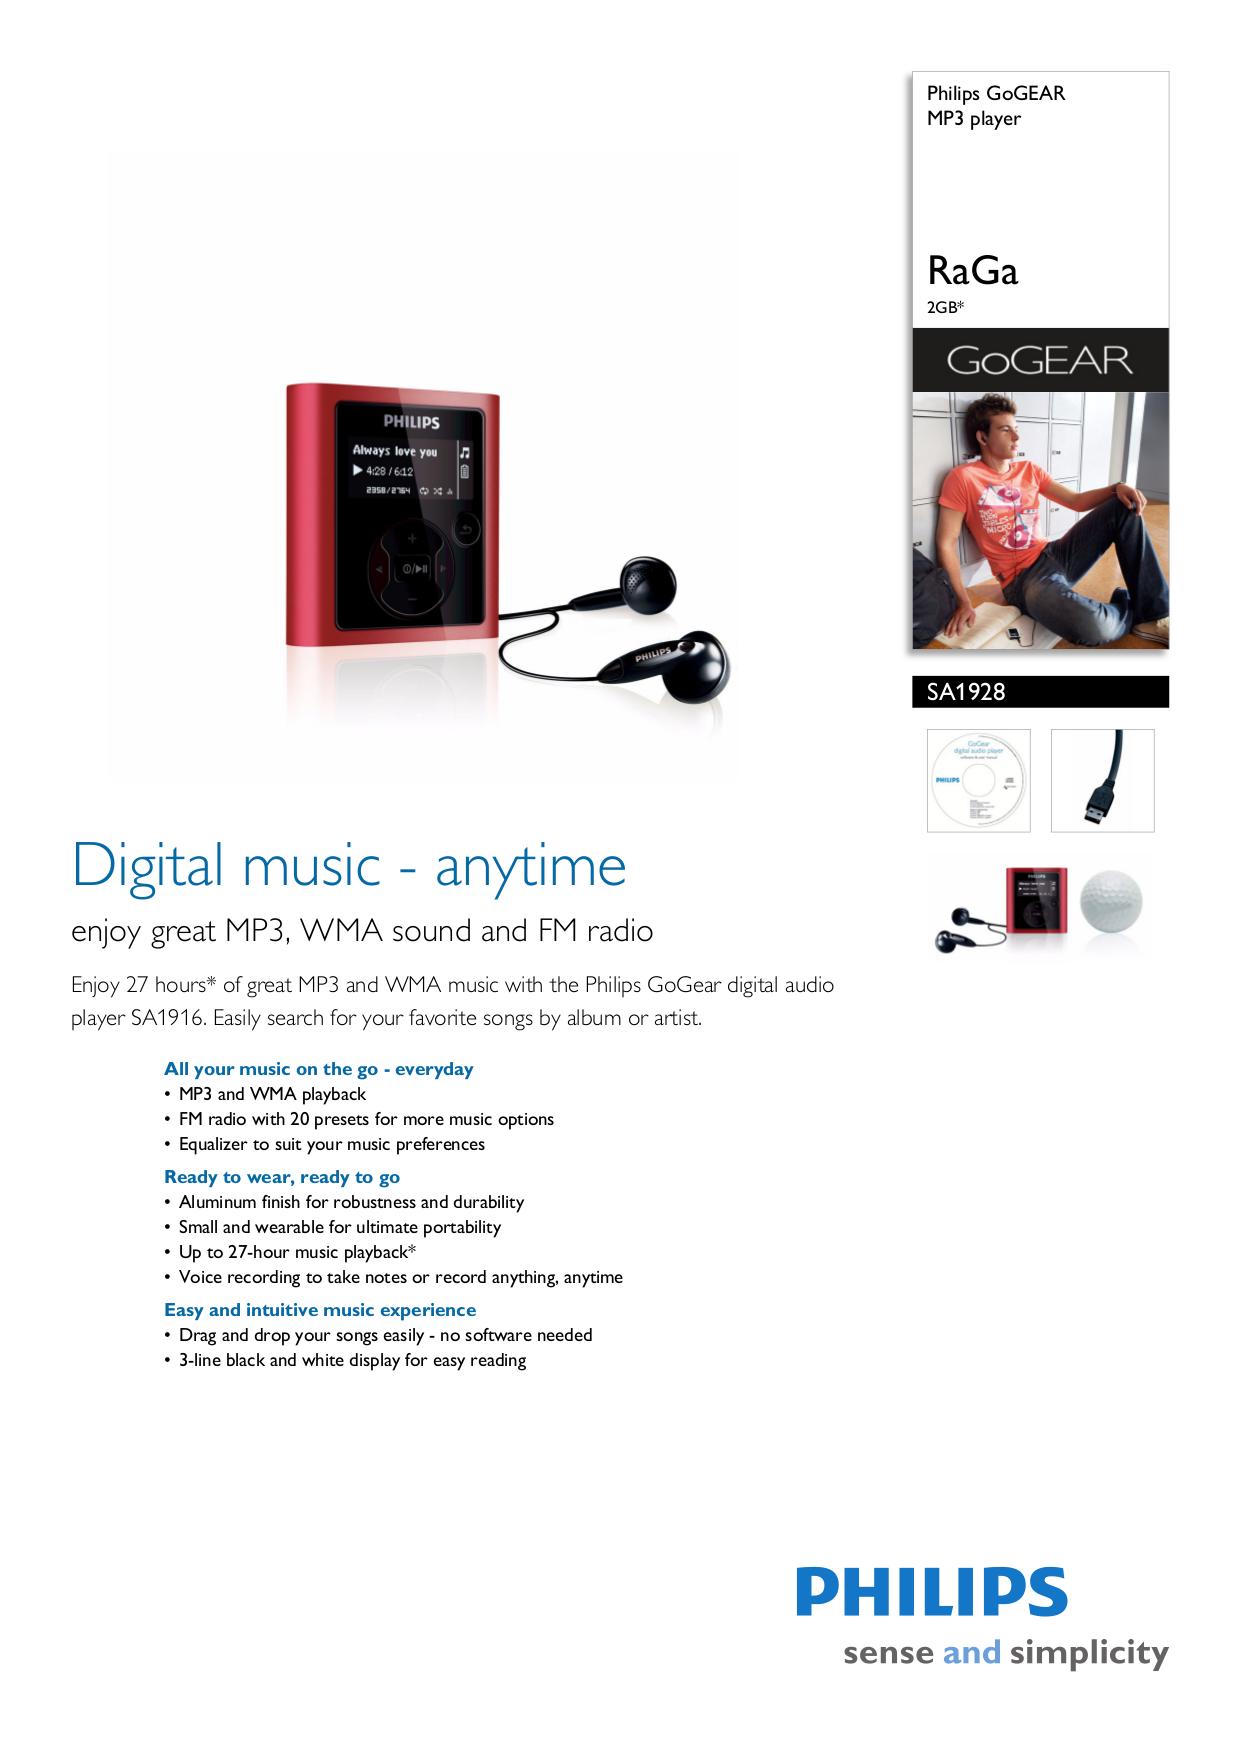 download free pdf for philips gogear sa1928 2gb mp3 player manual rh umlib com Philips GoGear MP3 Player Download philips gogear raga 2gb mp3 player manual